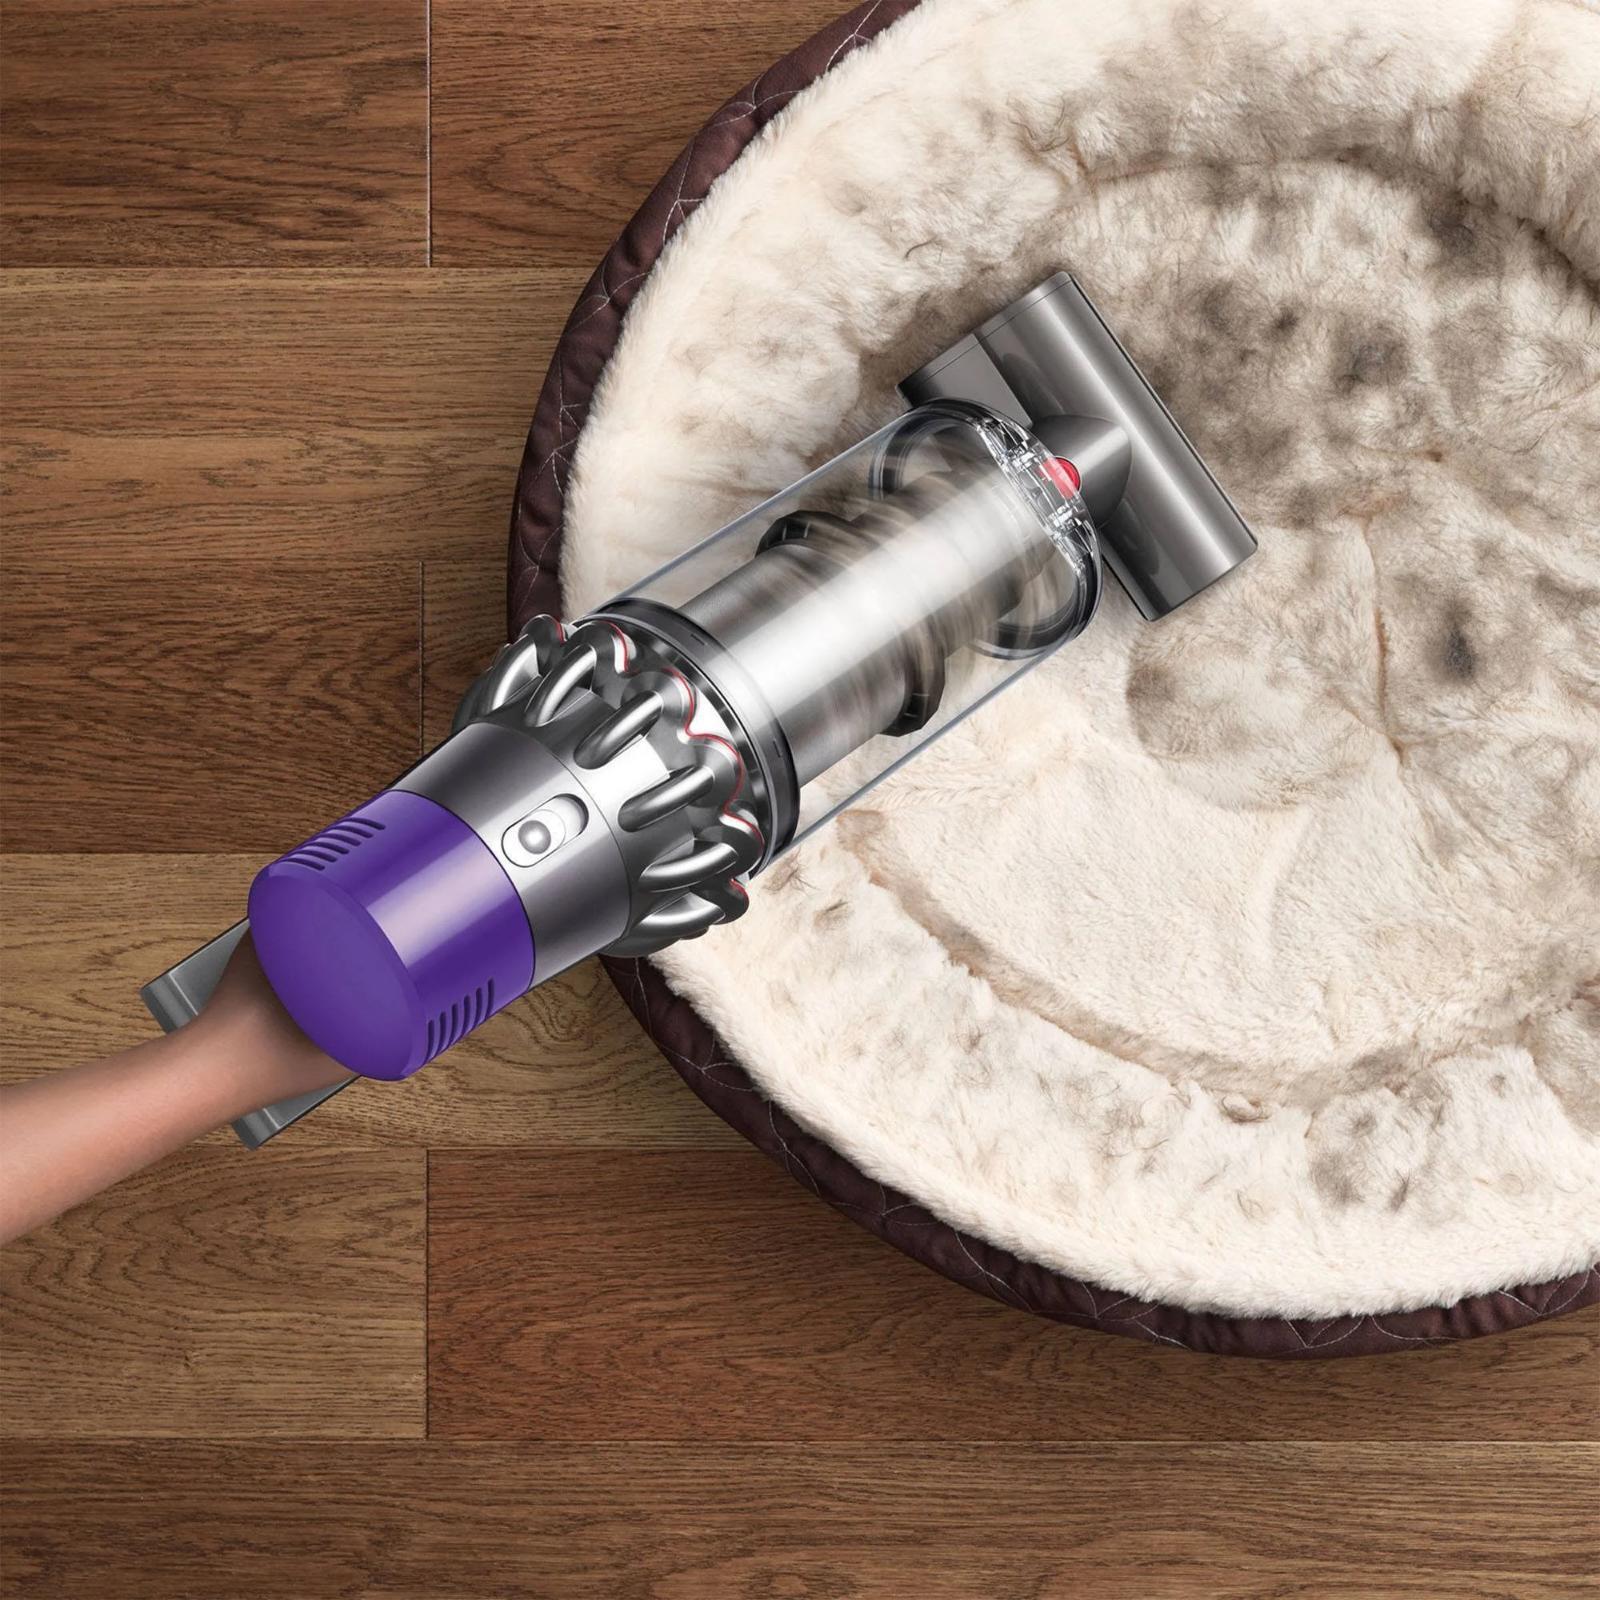 Dyson Cordless Stick Vacuum Iron